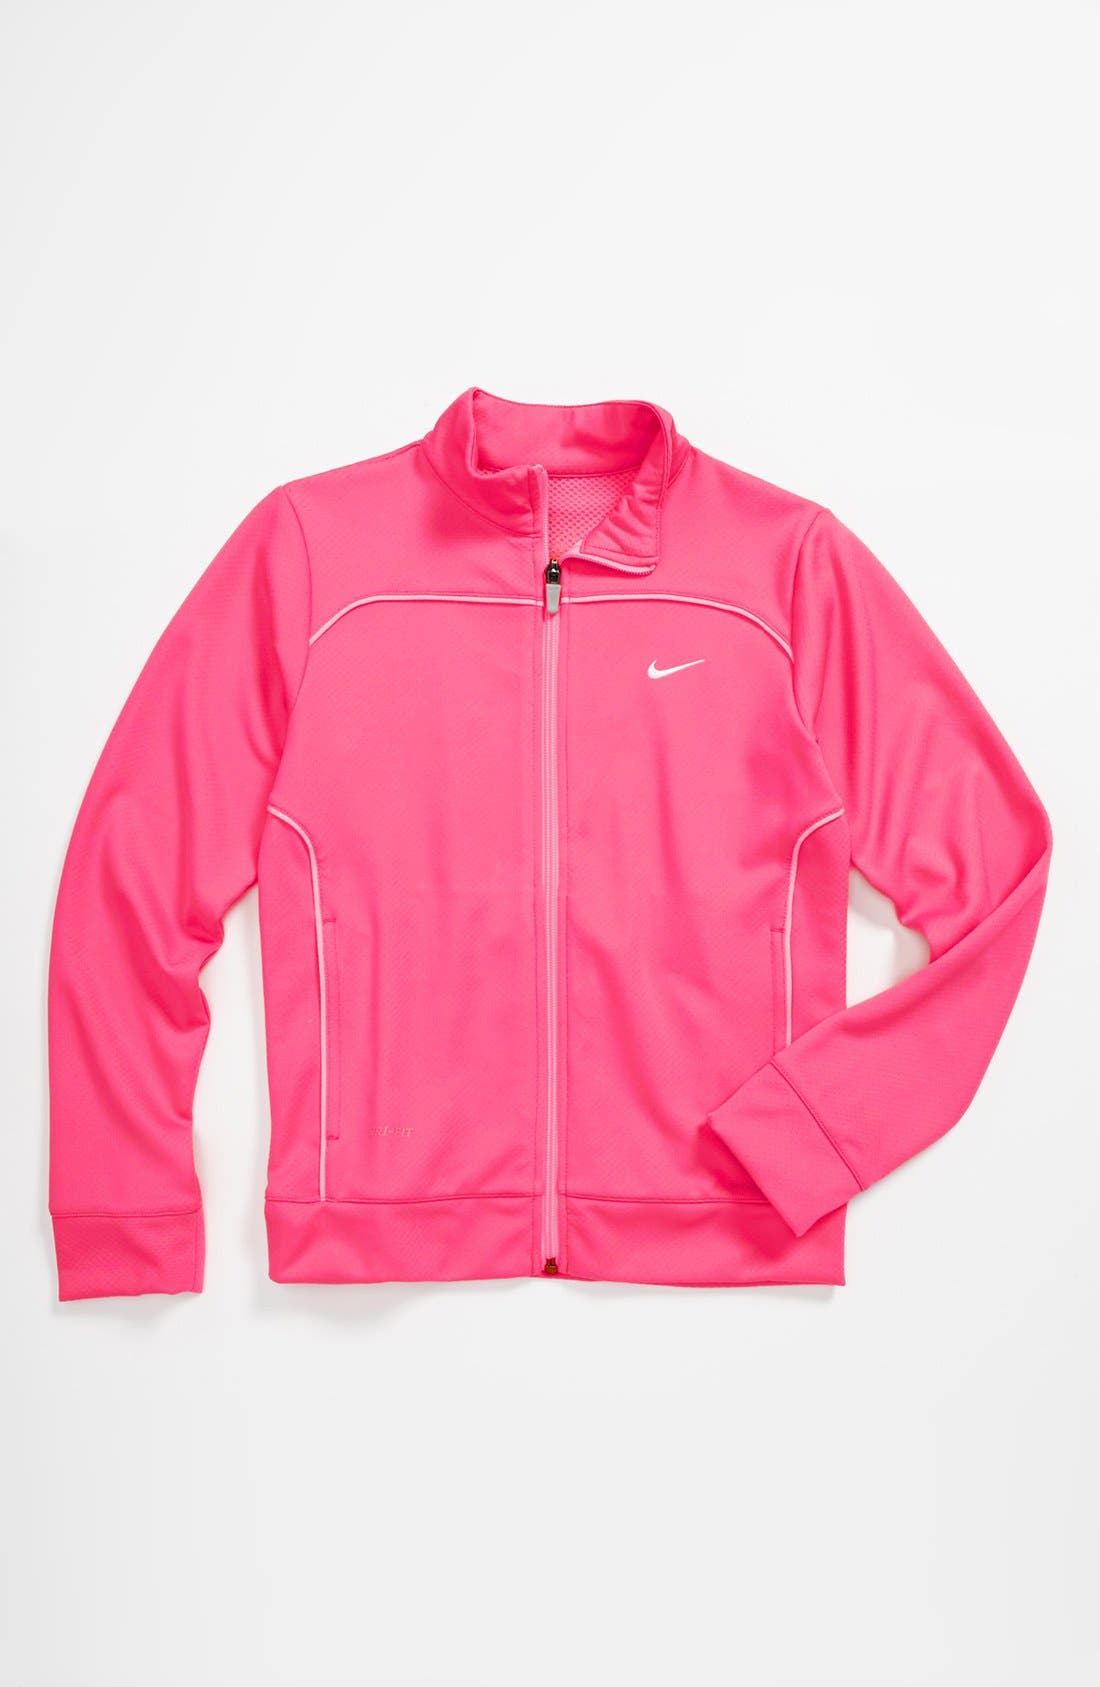 Alternate Image 1 Selected - Nike Dri-FIT Jacket (Big Girls)